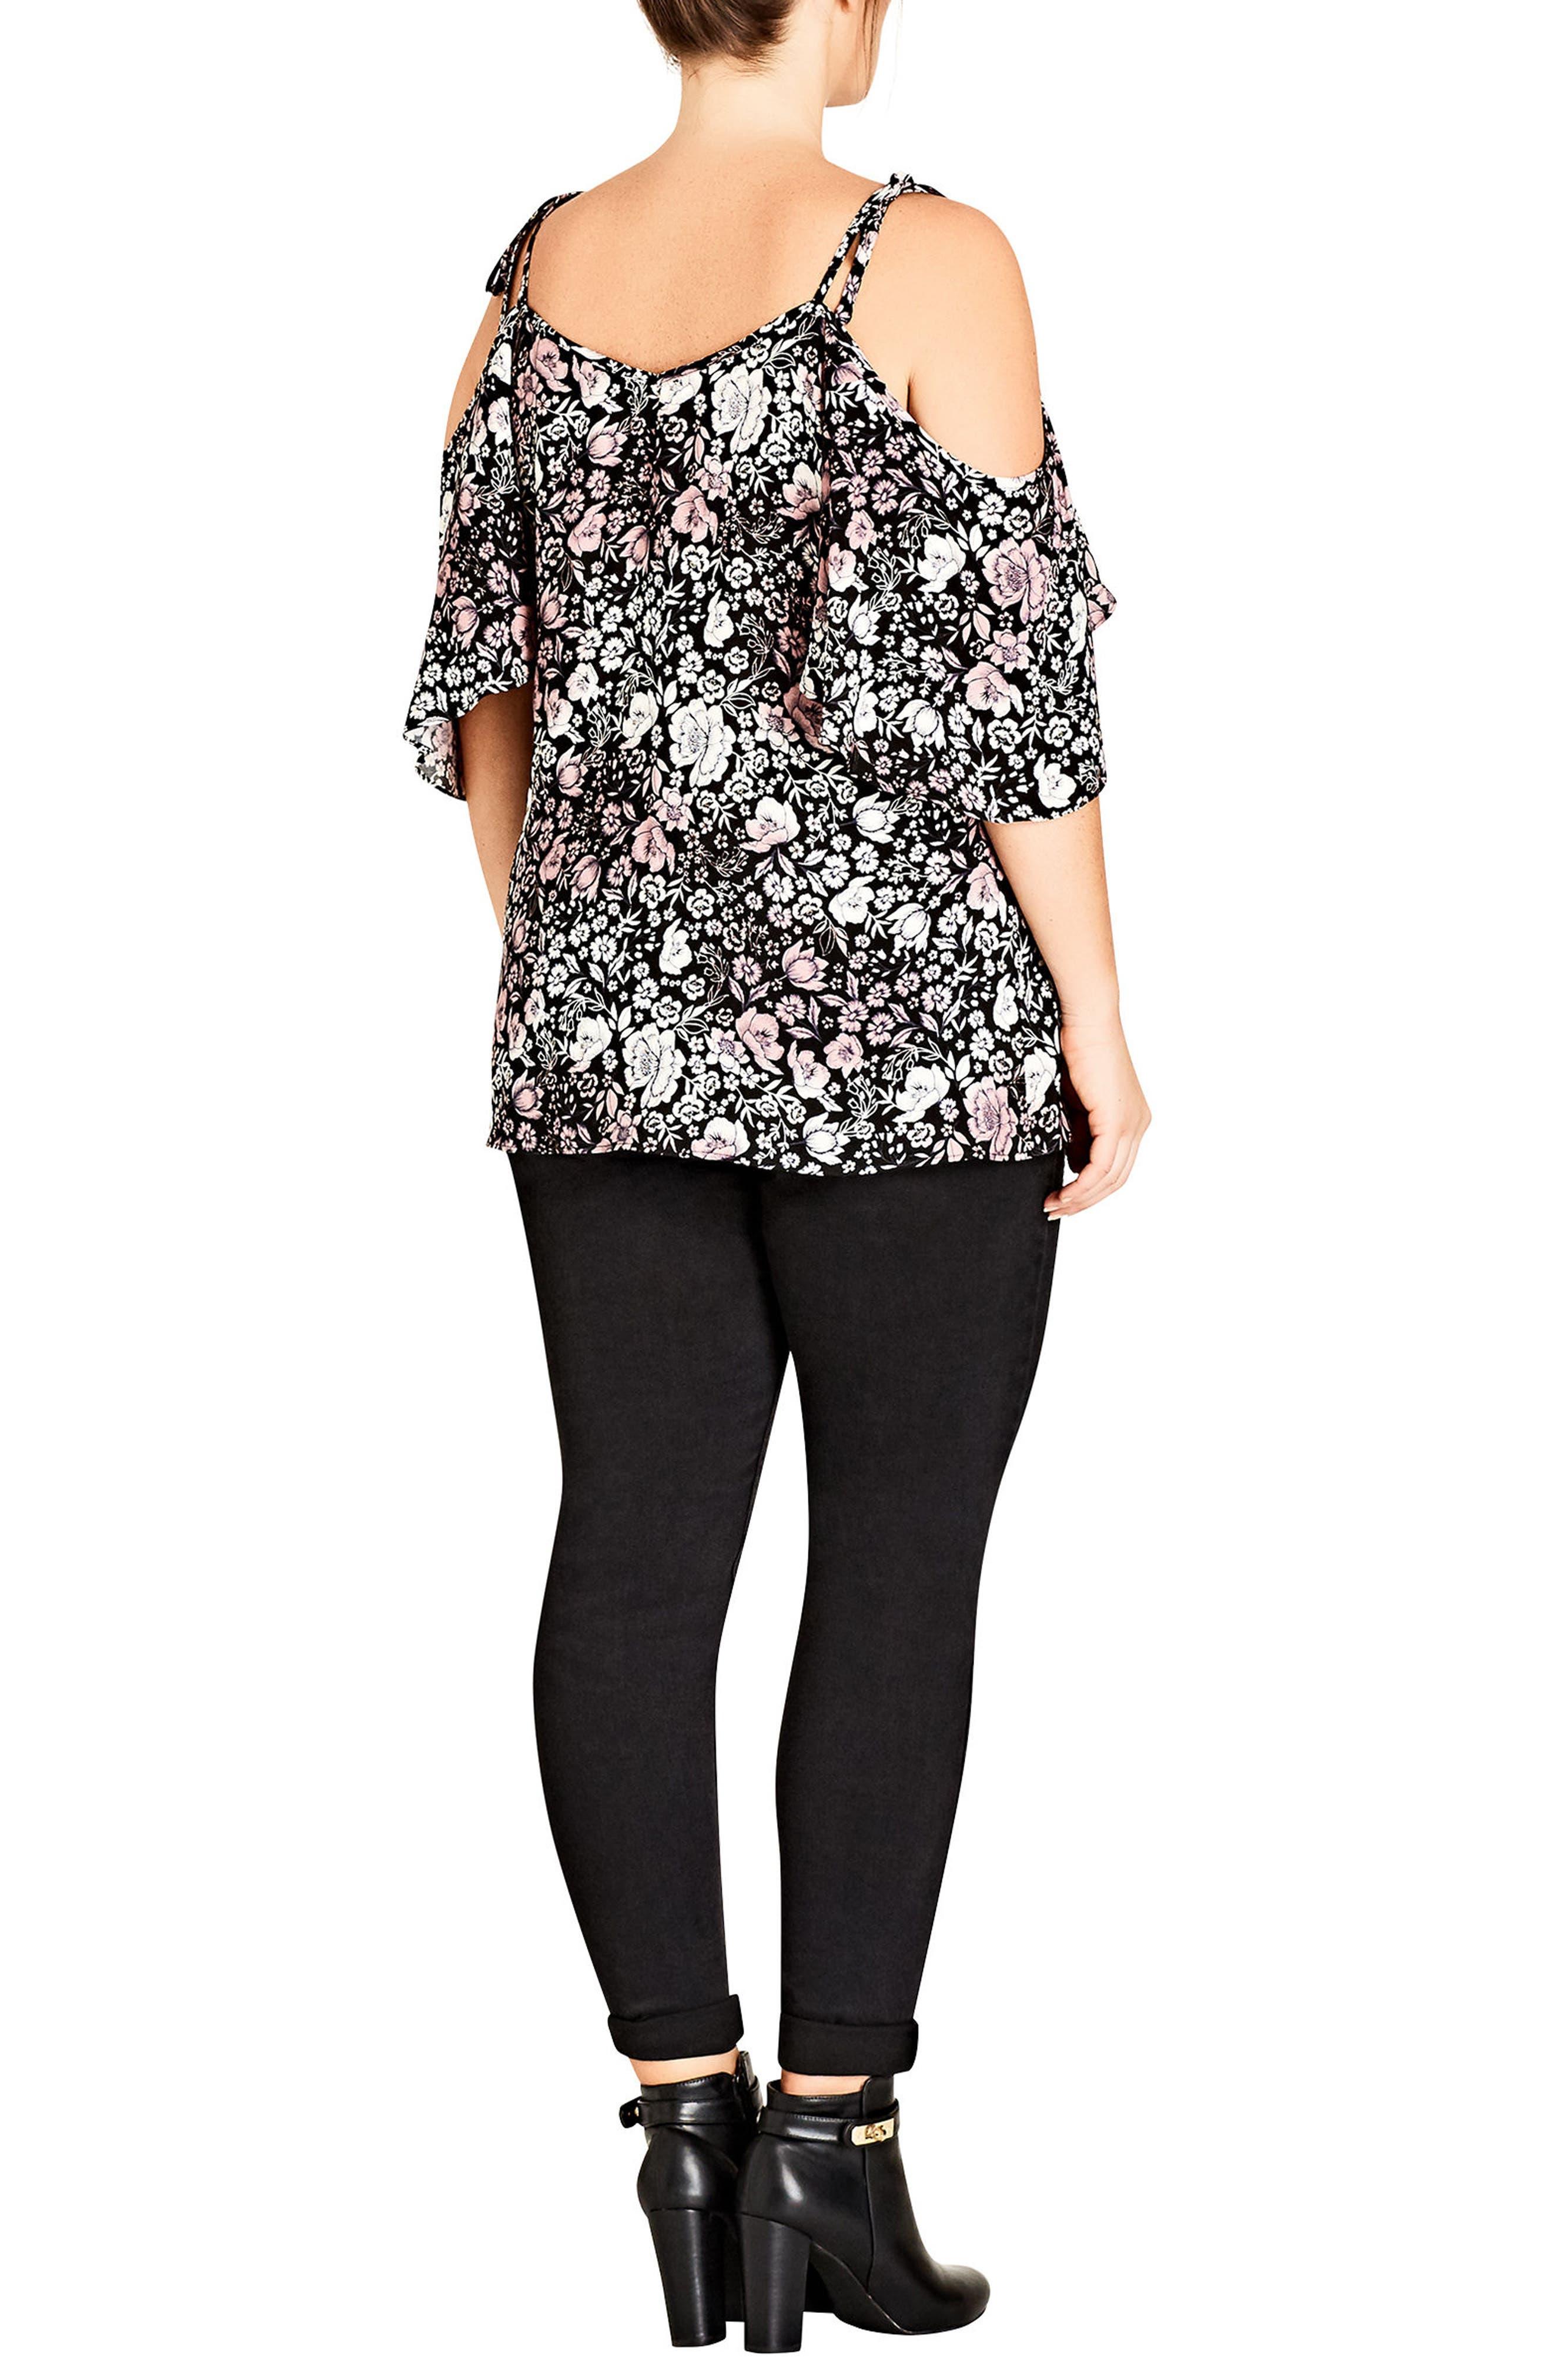 Alternate Image 2  - City Chic Etched Floral Cold Shoulder Top (Plus Size)